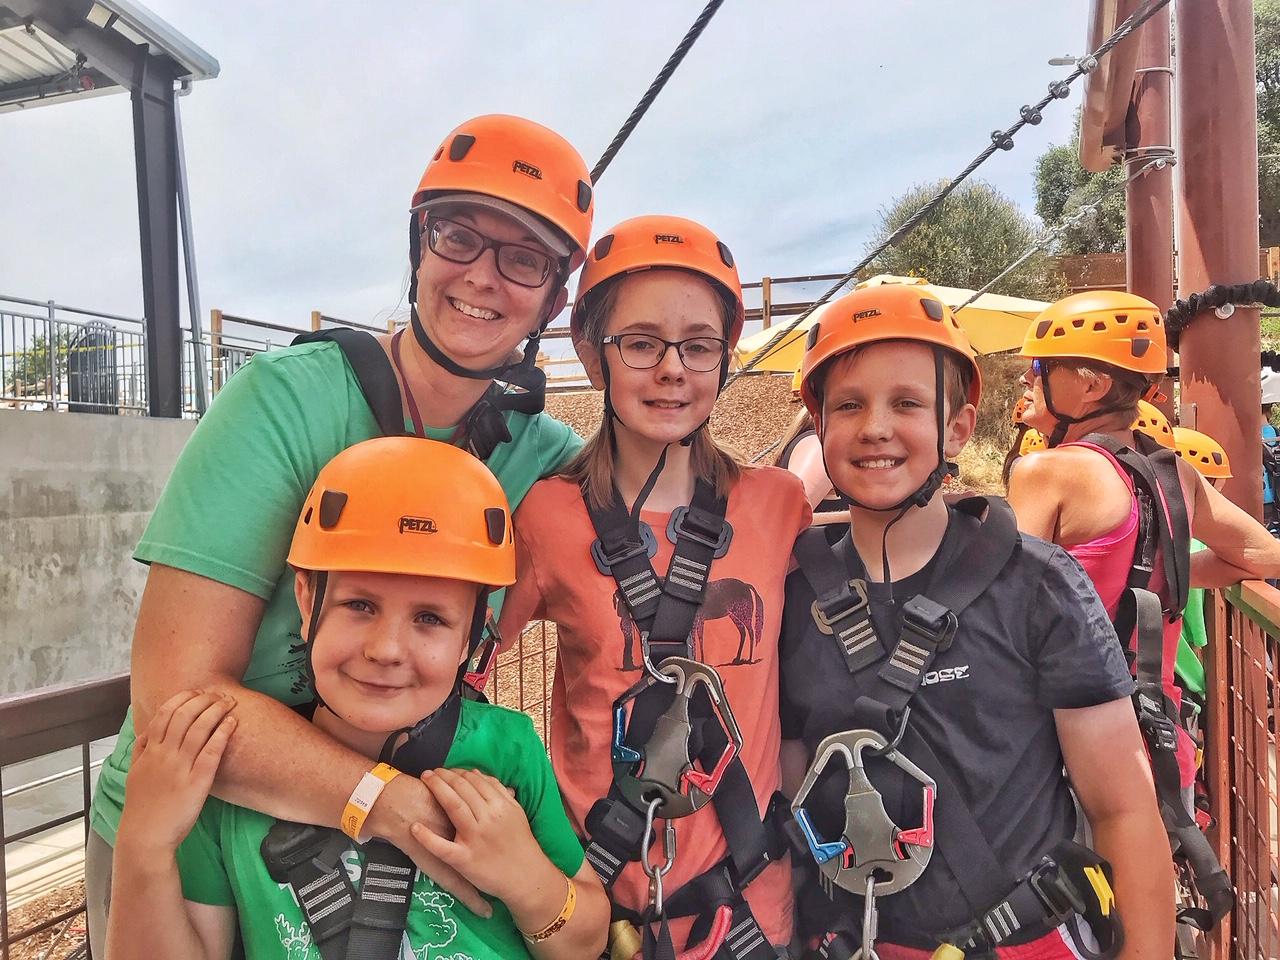 Go Here Now: Quarry Park Adventures in Rocklin